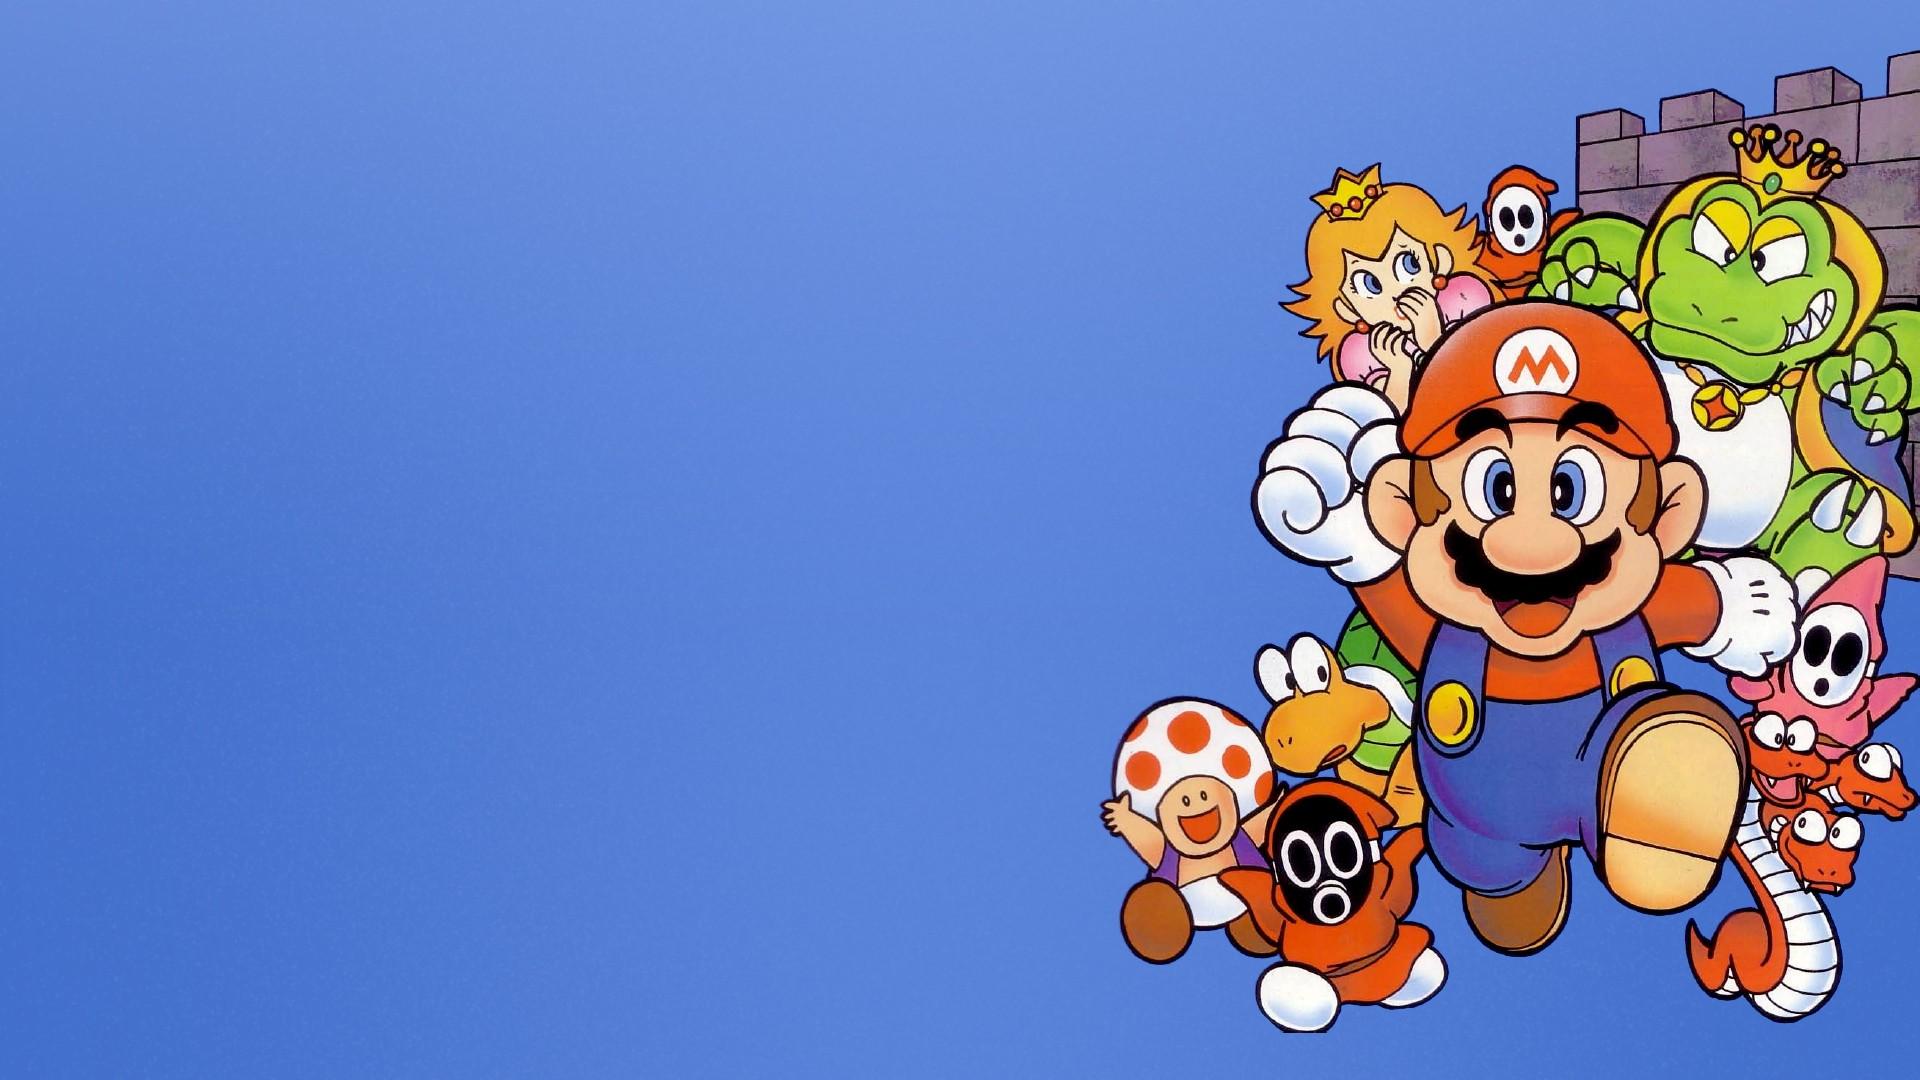 Hintergrundbilder : Illustration, Karikatur, Super Mario, Spielzeug ...